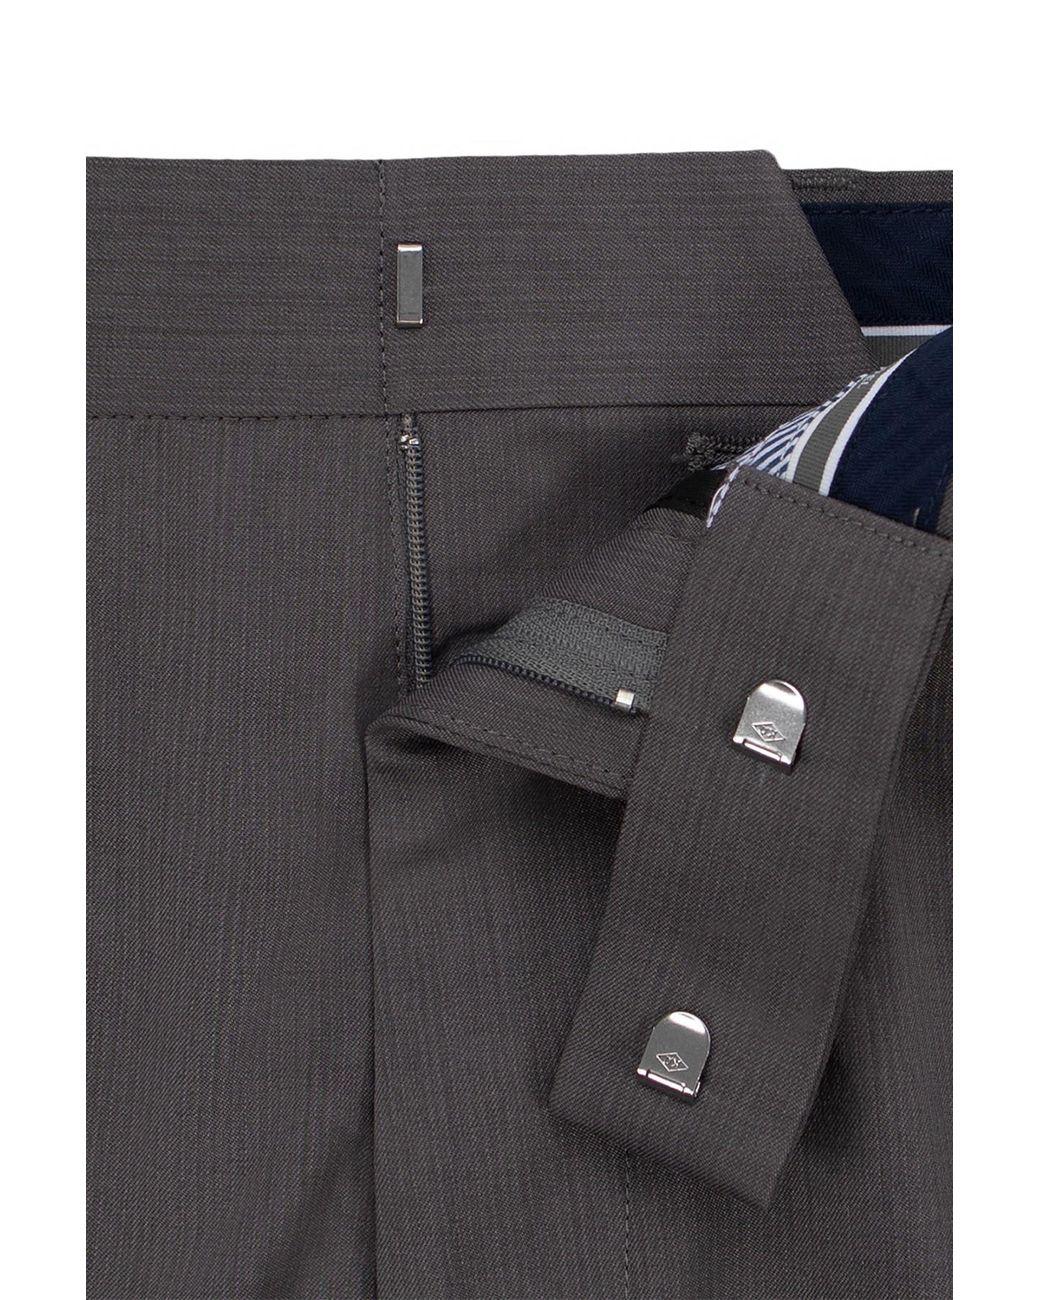 Sean John Classic Fit Black Birdseye Textured Flat Front Hemmed Dress Pants